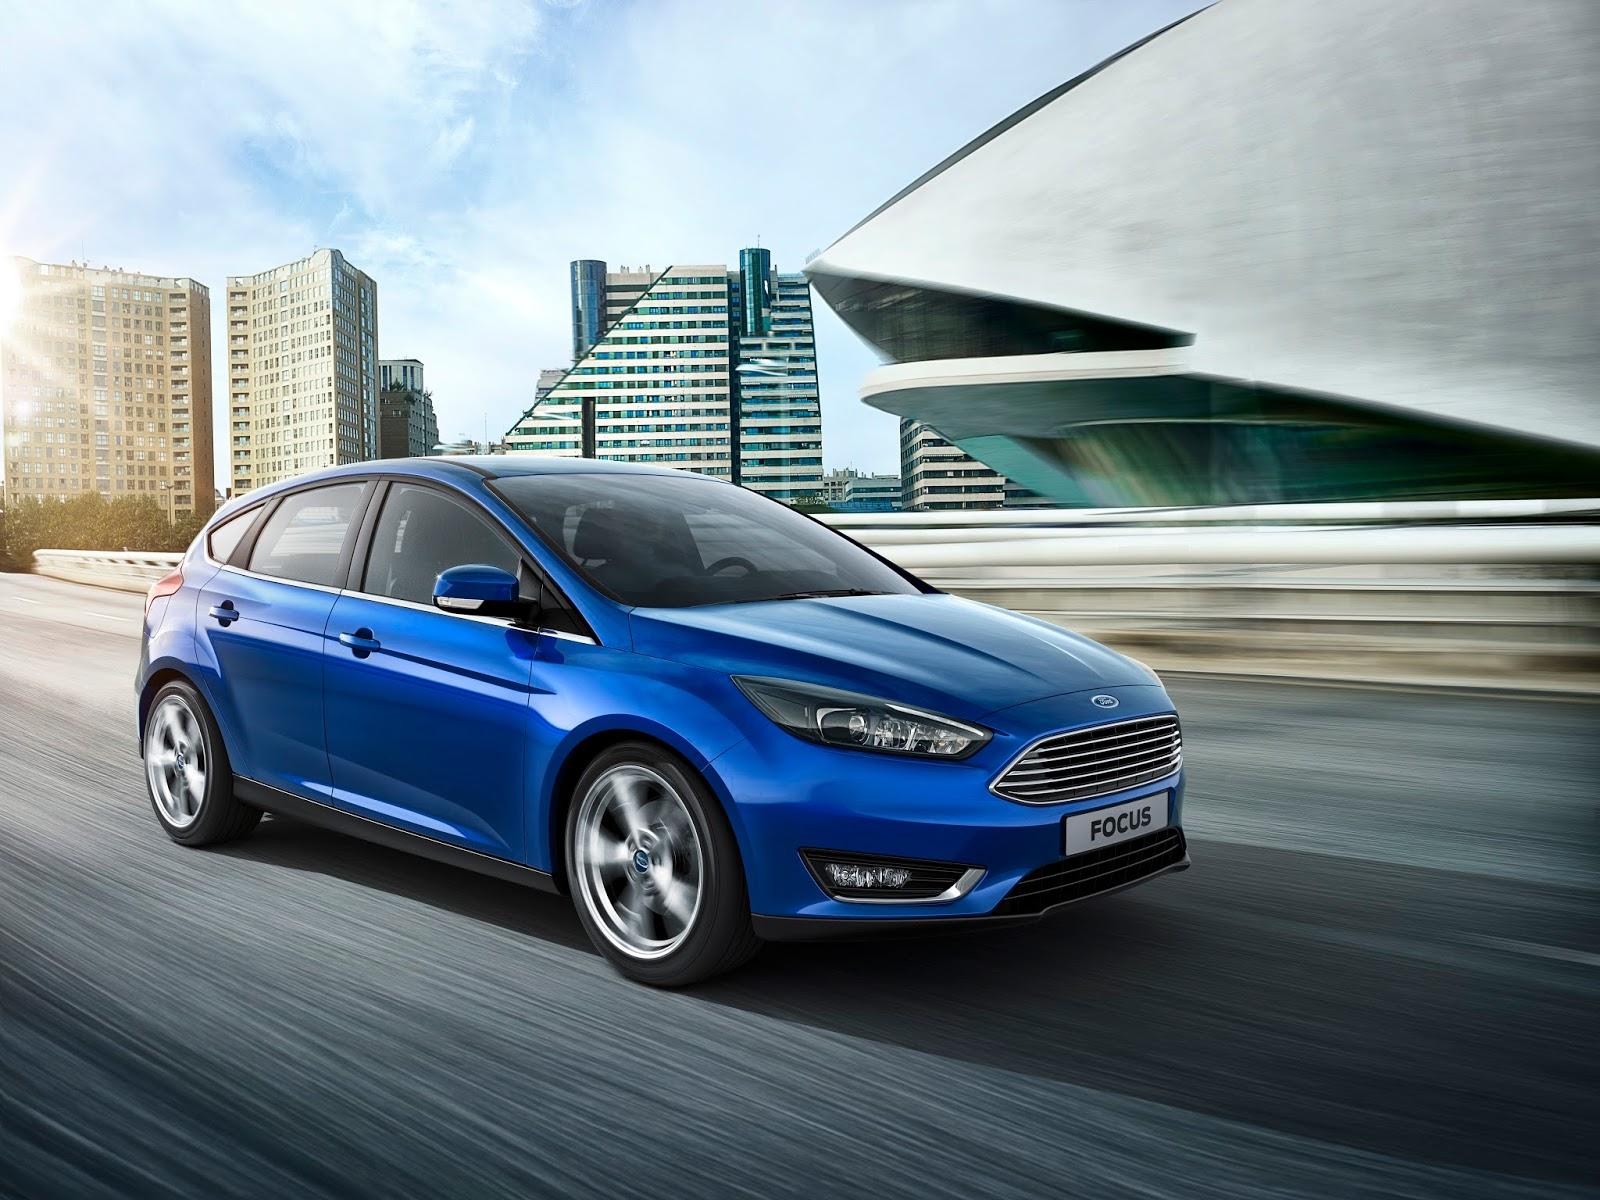 NewFordFocus 06 Το νέο Ford Focus 1.5L diesel καταναλώνει μόλις 3,4lt/100Km και έχει μηδενικά τέλη κυκλοφορίας